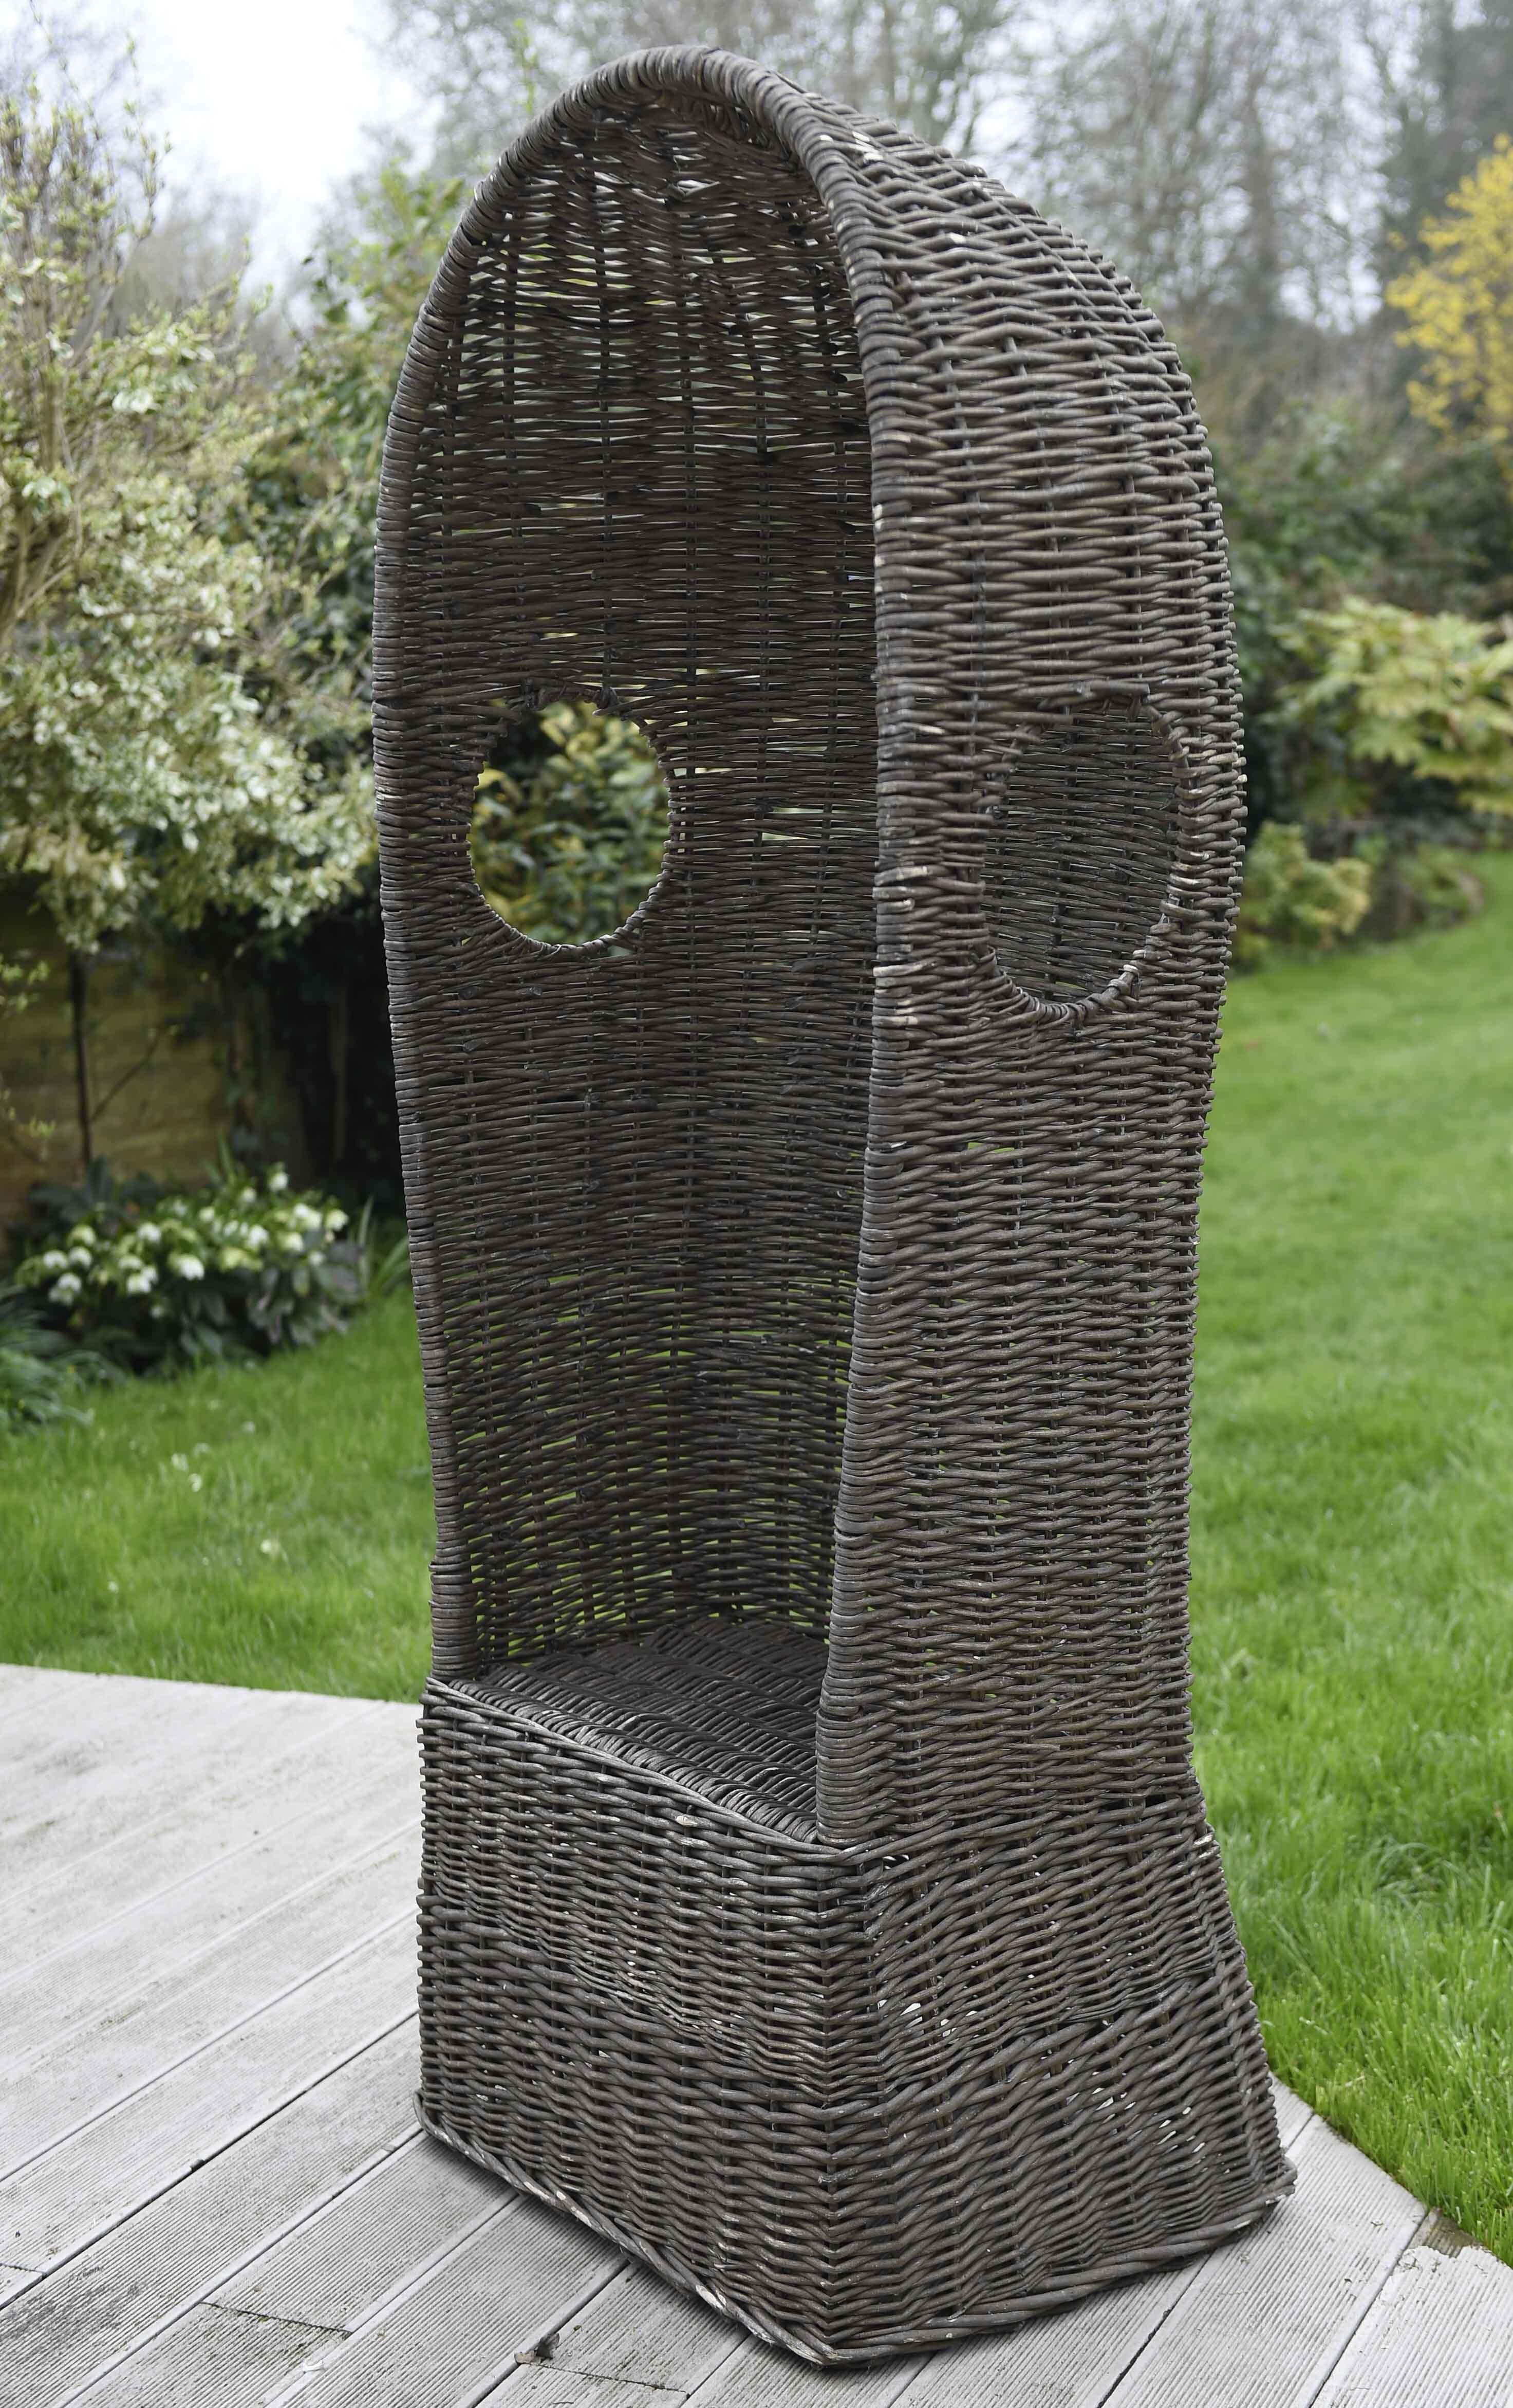 19th-century-antique-wicker-porter-s-hooded-garden-chair